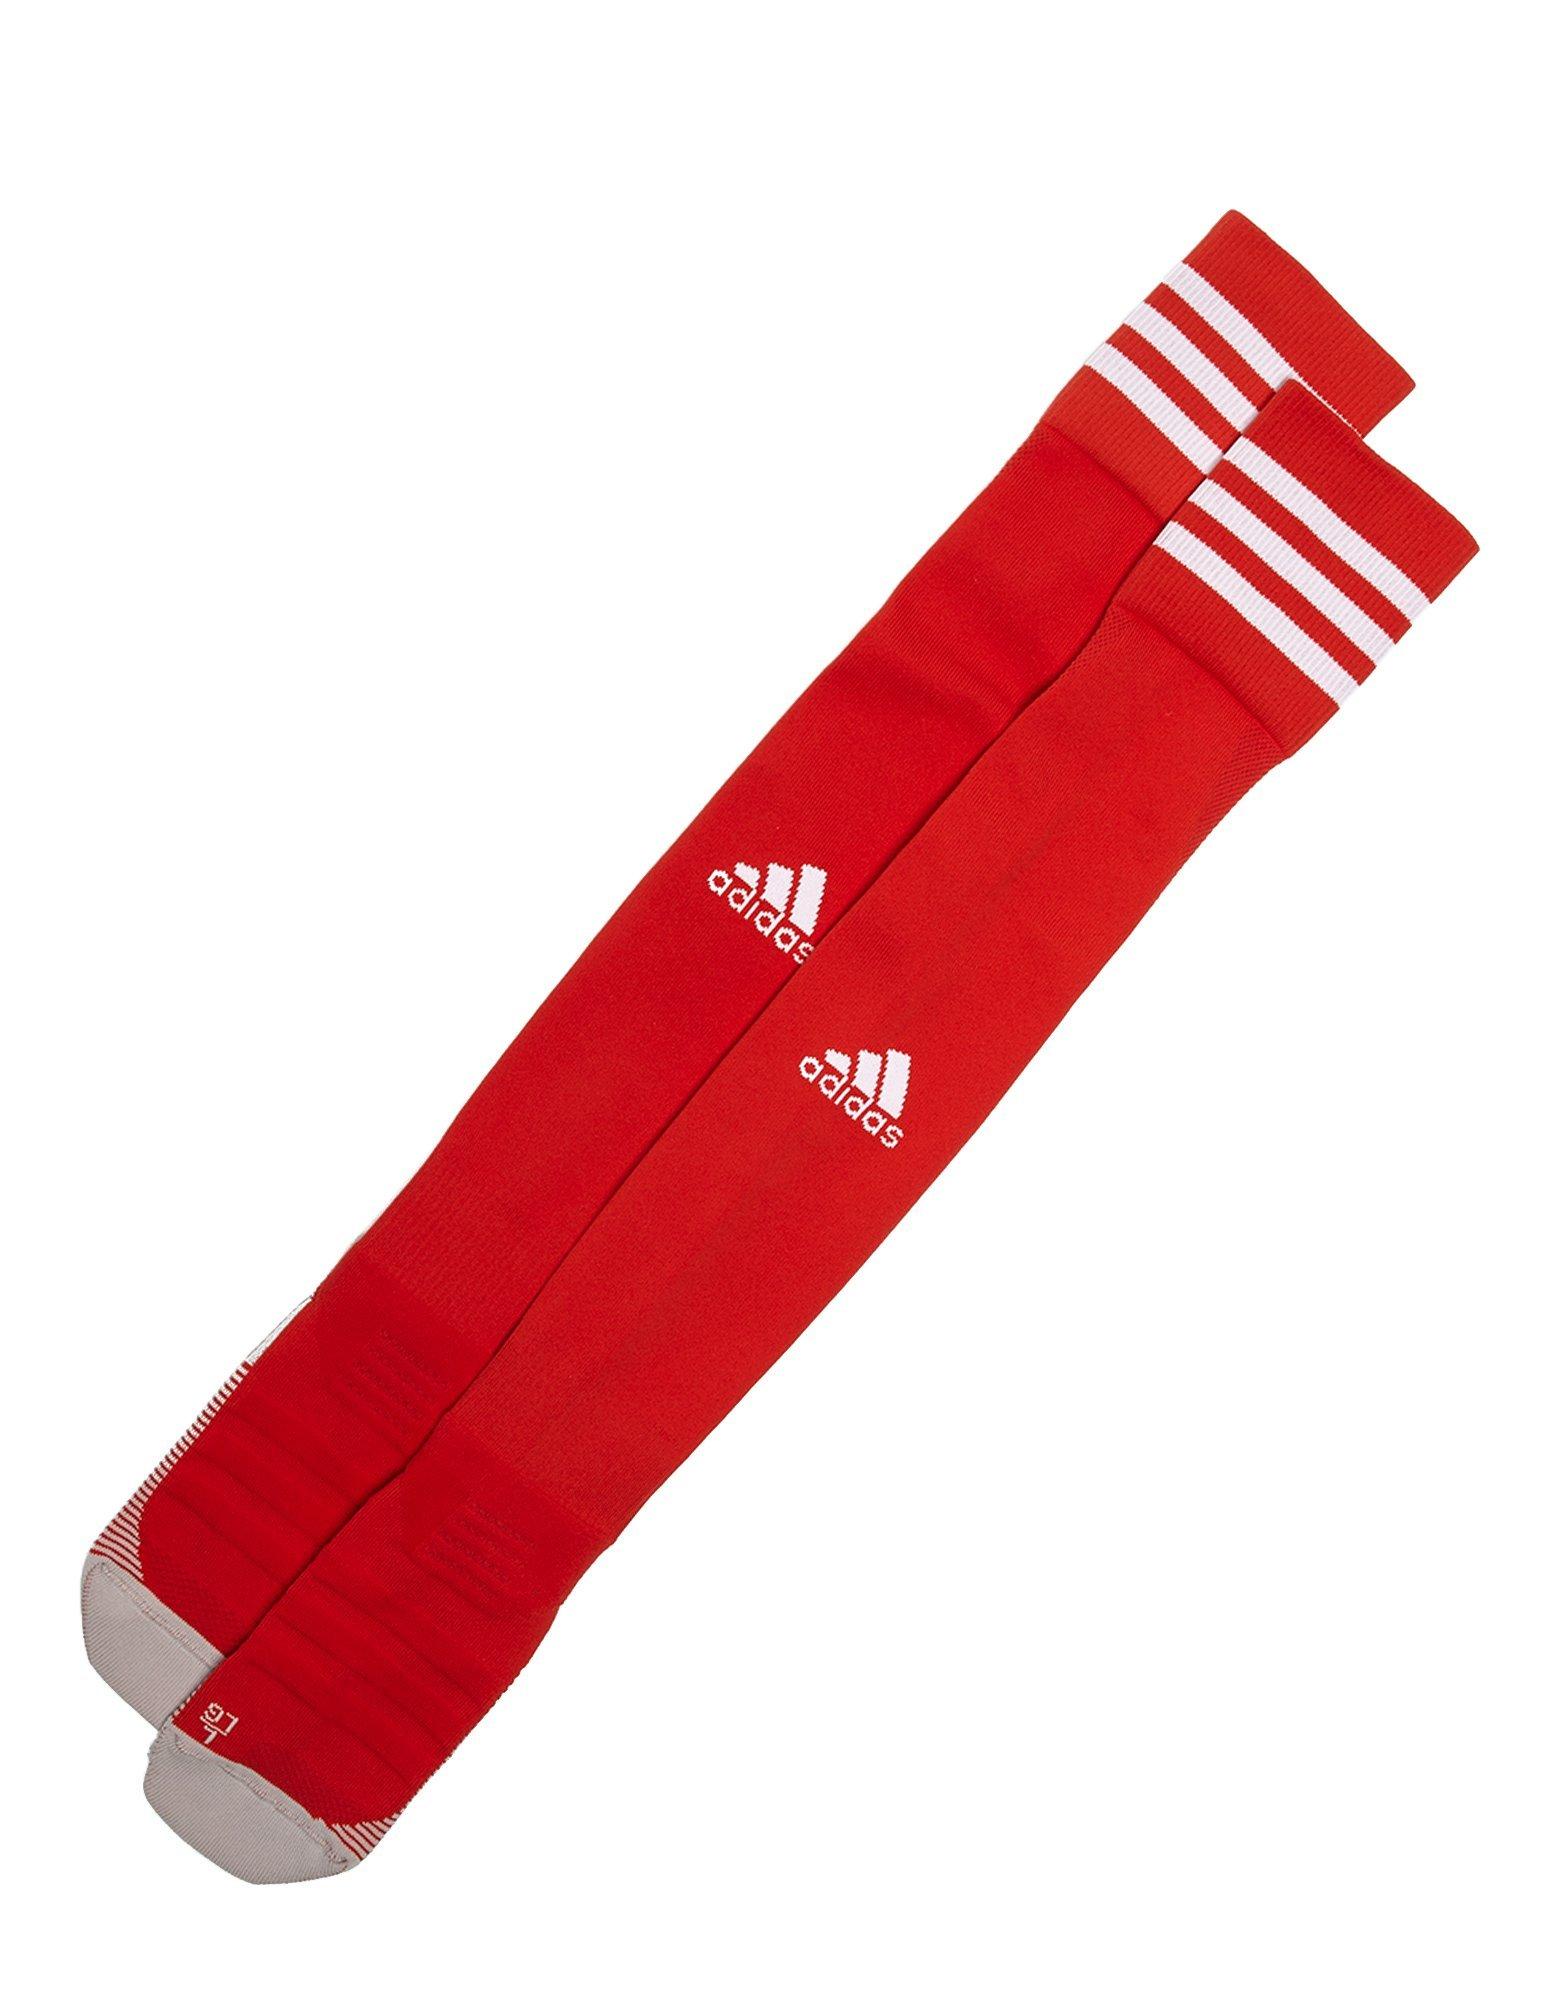 adidas Scotland 2018/19 Home Socks